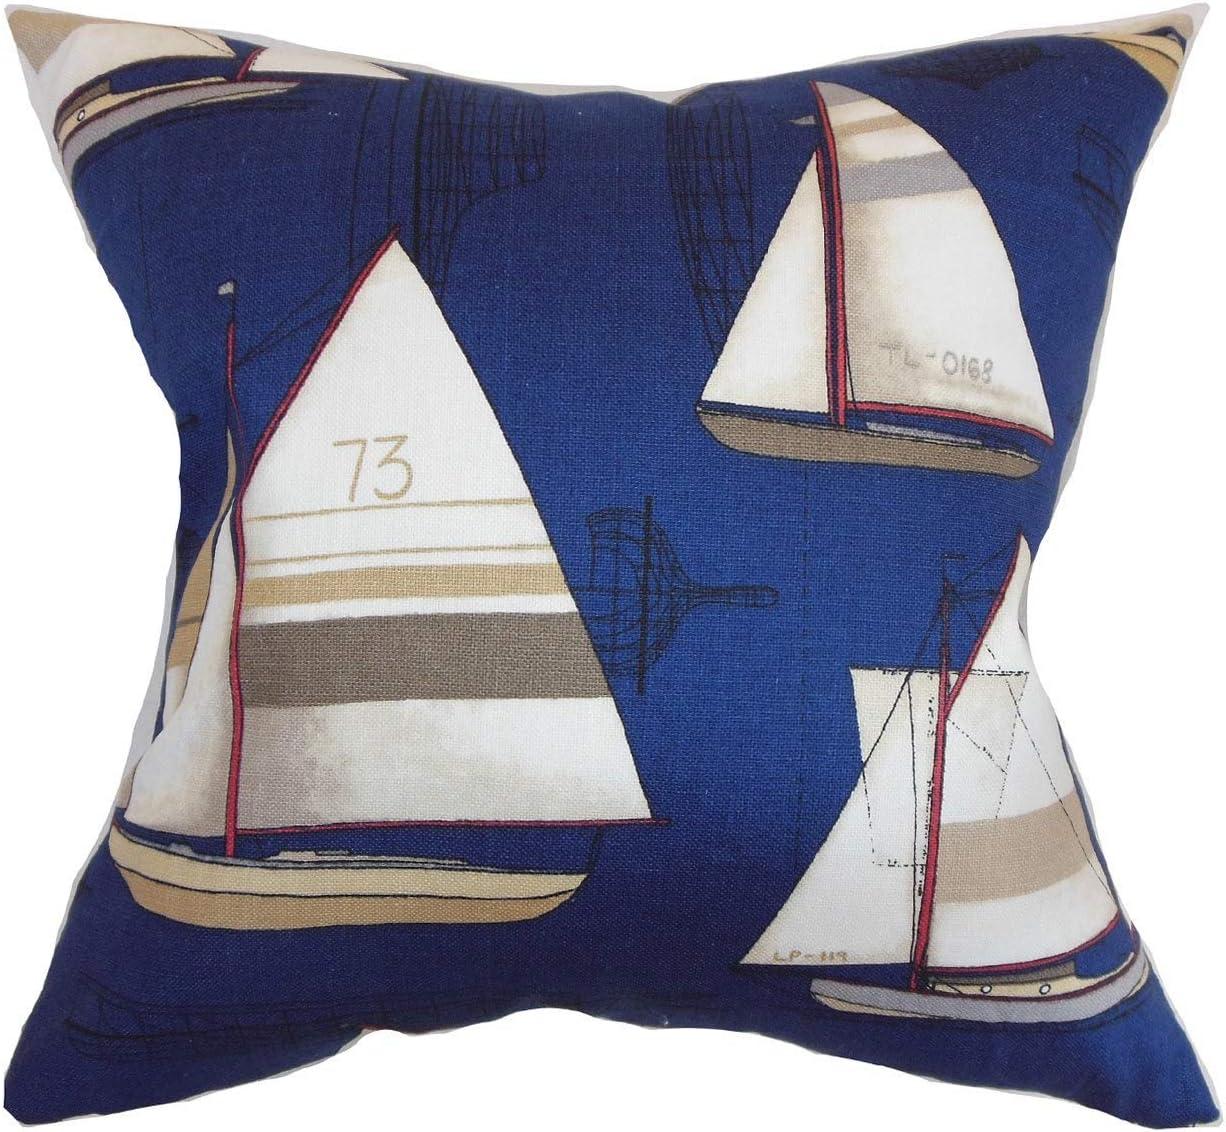 Amazon Com The Pillow Collection Hemavan Nautical Regatta Down Filled Throw Pillow Home Kitchen